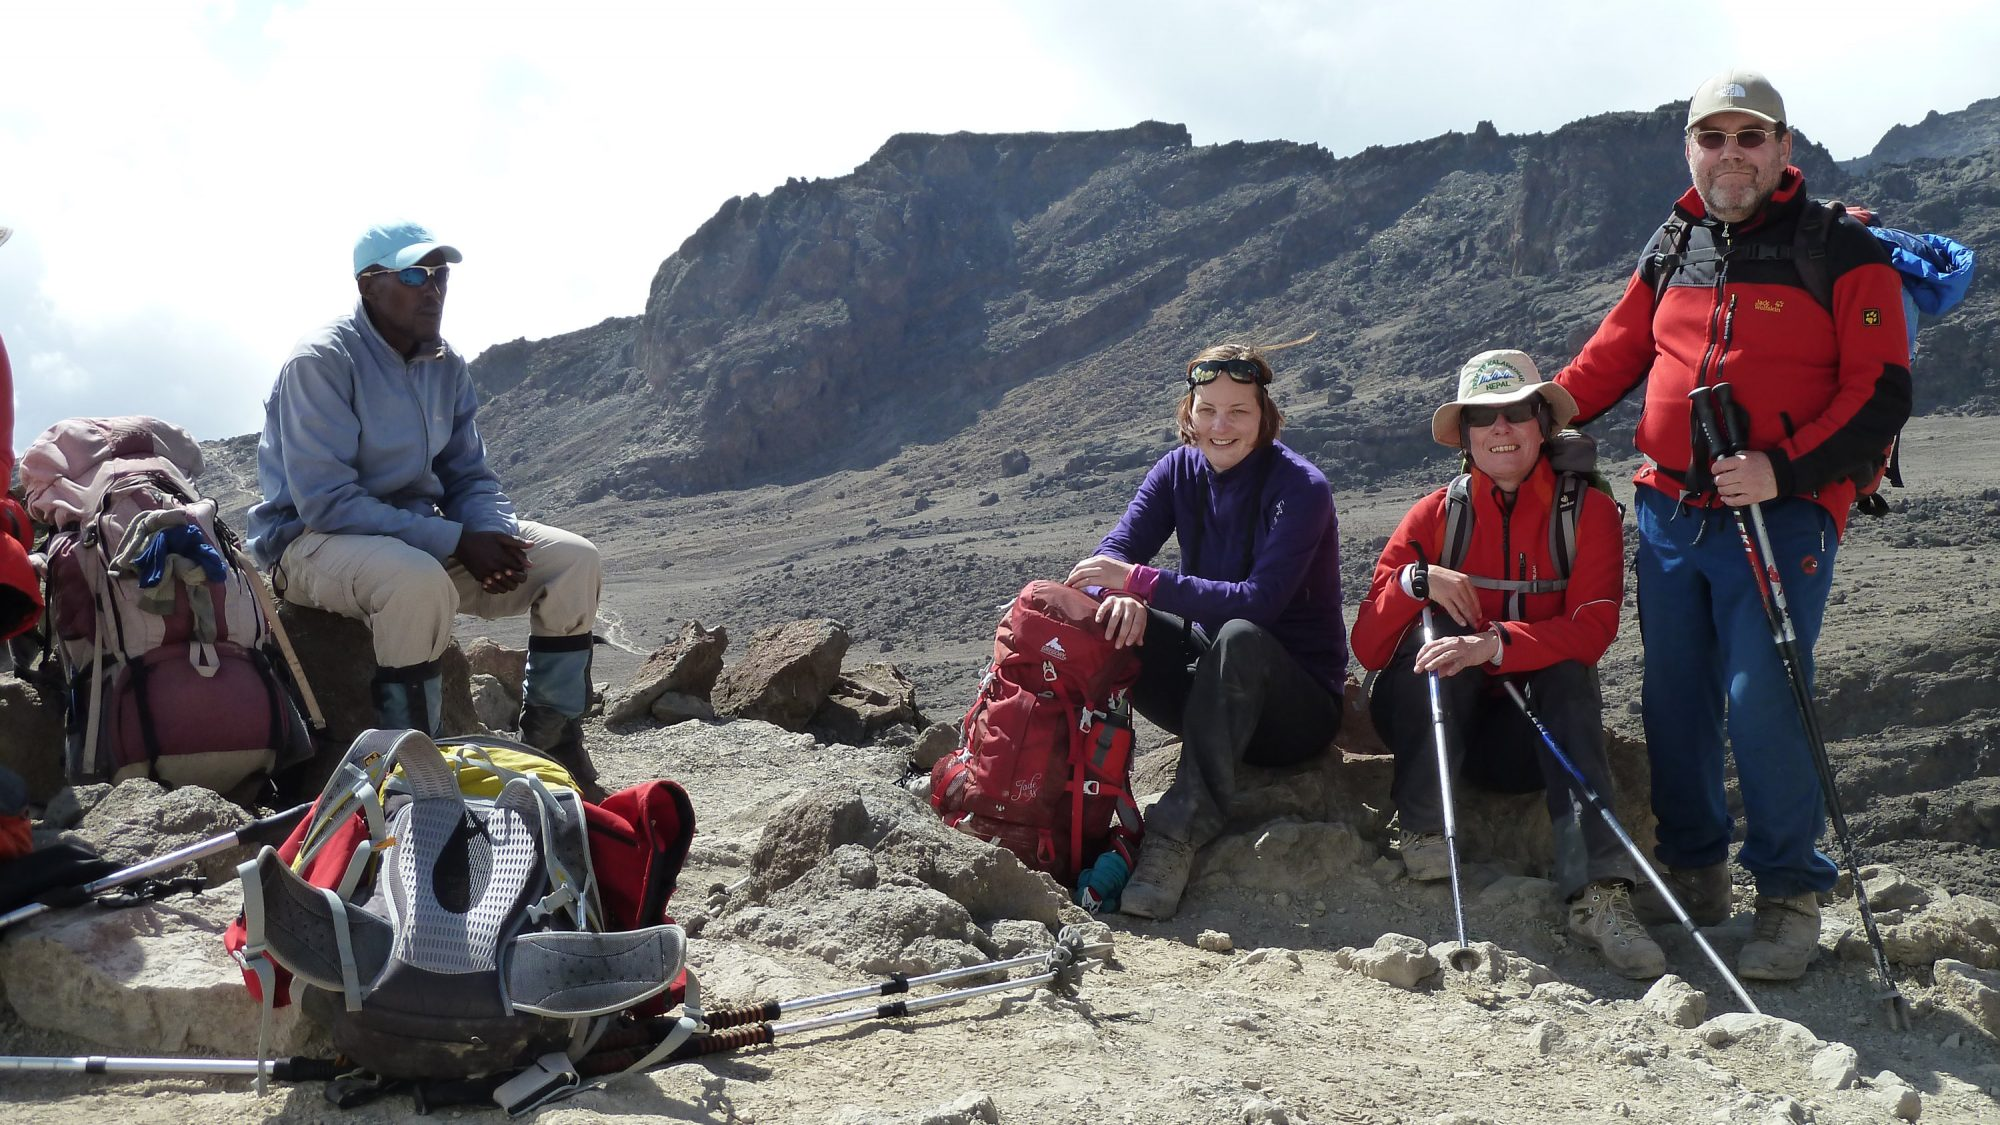 Pause, Kilimandscharo, Kilimandscharo besteigen, Tansania, Afrika, Kilimandscharo Tour, Erfahrungsbericht, Machame Route